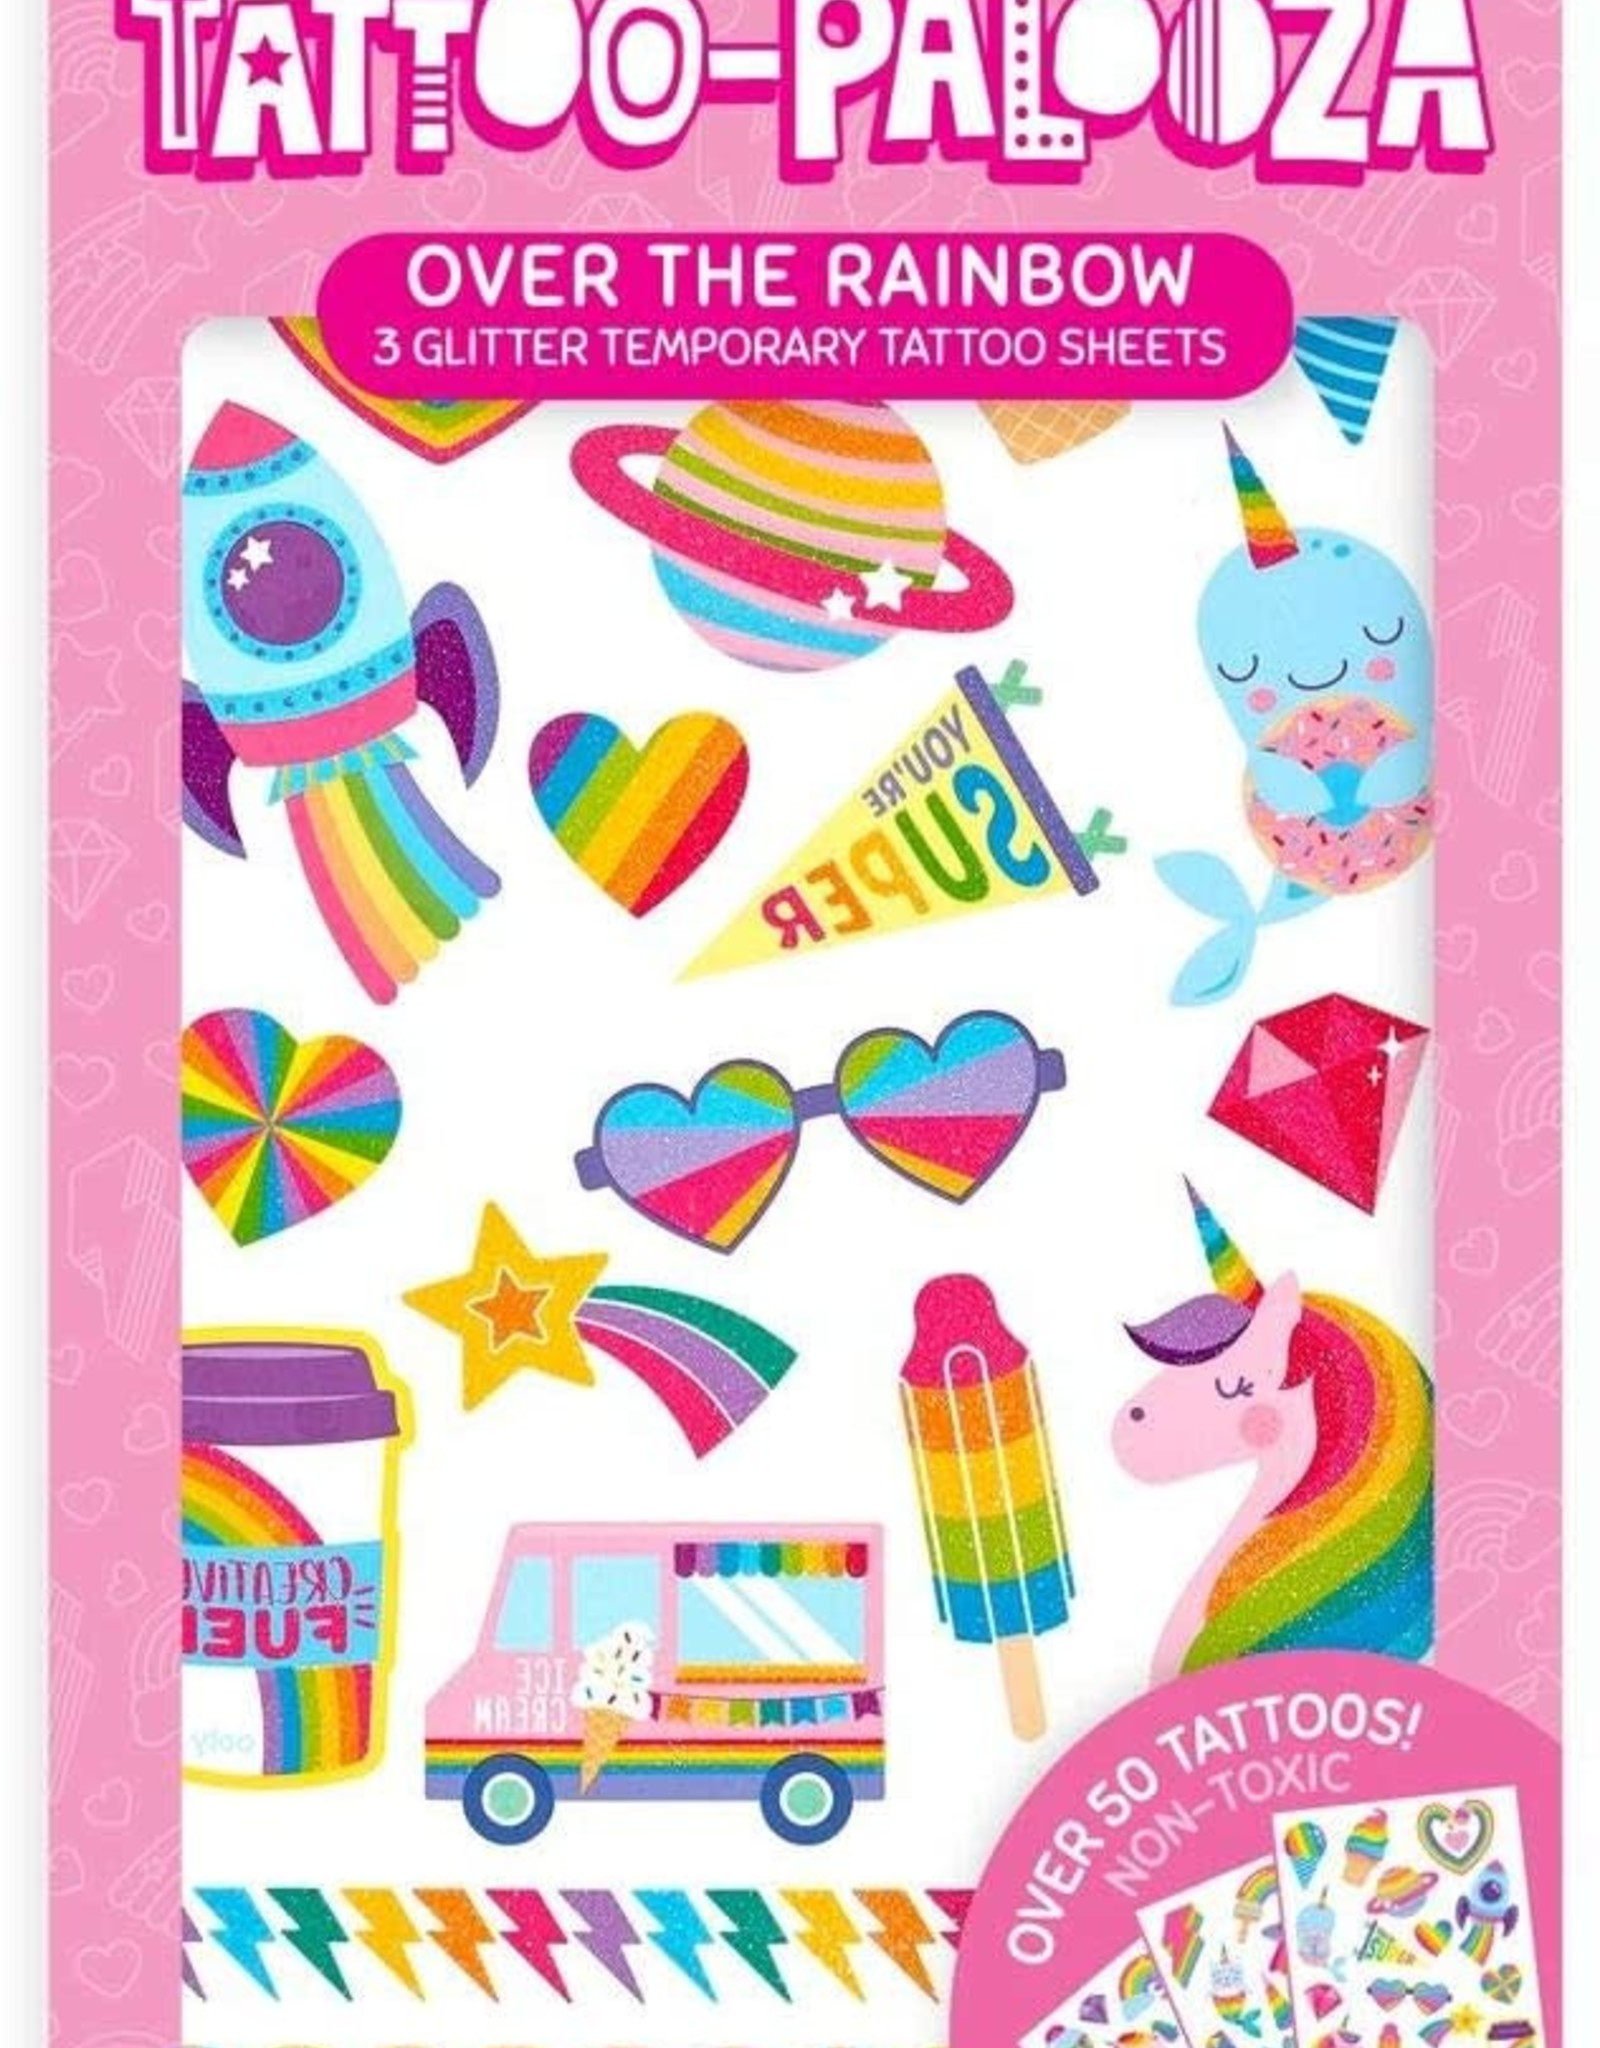 Ooly Tattoo Palooza Temporary Tattoos - Over the Rainbow